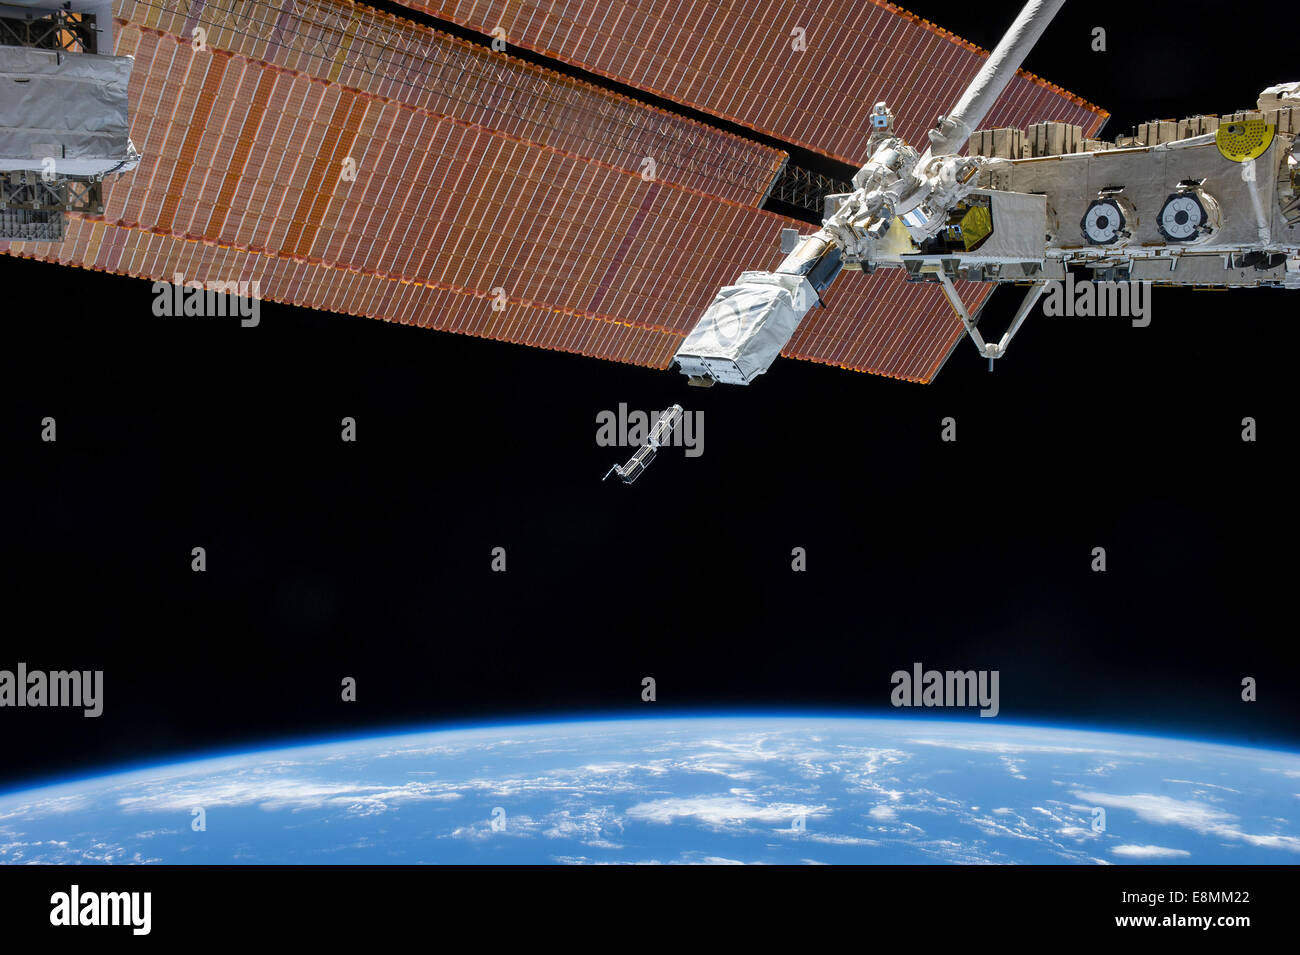 February 11, 2014 - The Small Satellite Orbital Deployer (SSOD), in the grasp of the Kibo laboratory robotic arm, - Stock Image